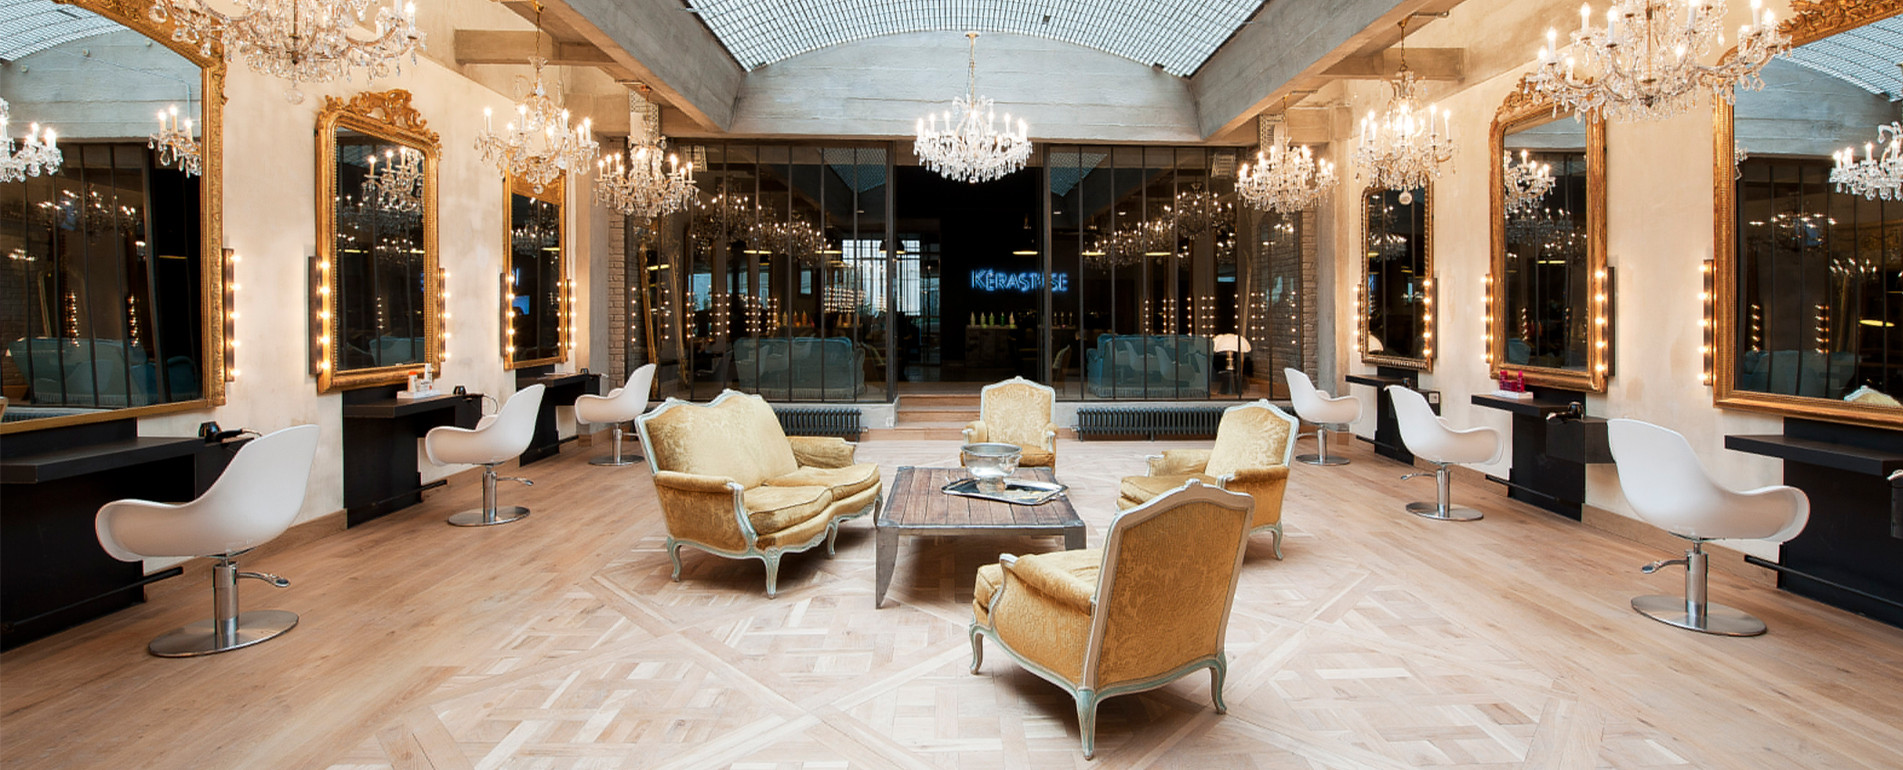 Photo Mobilier Salon De Coiffure Luxe